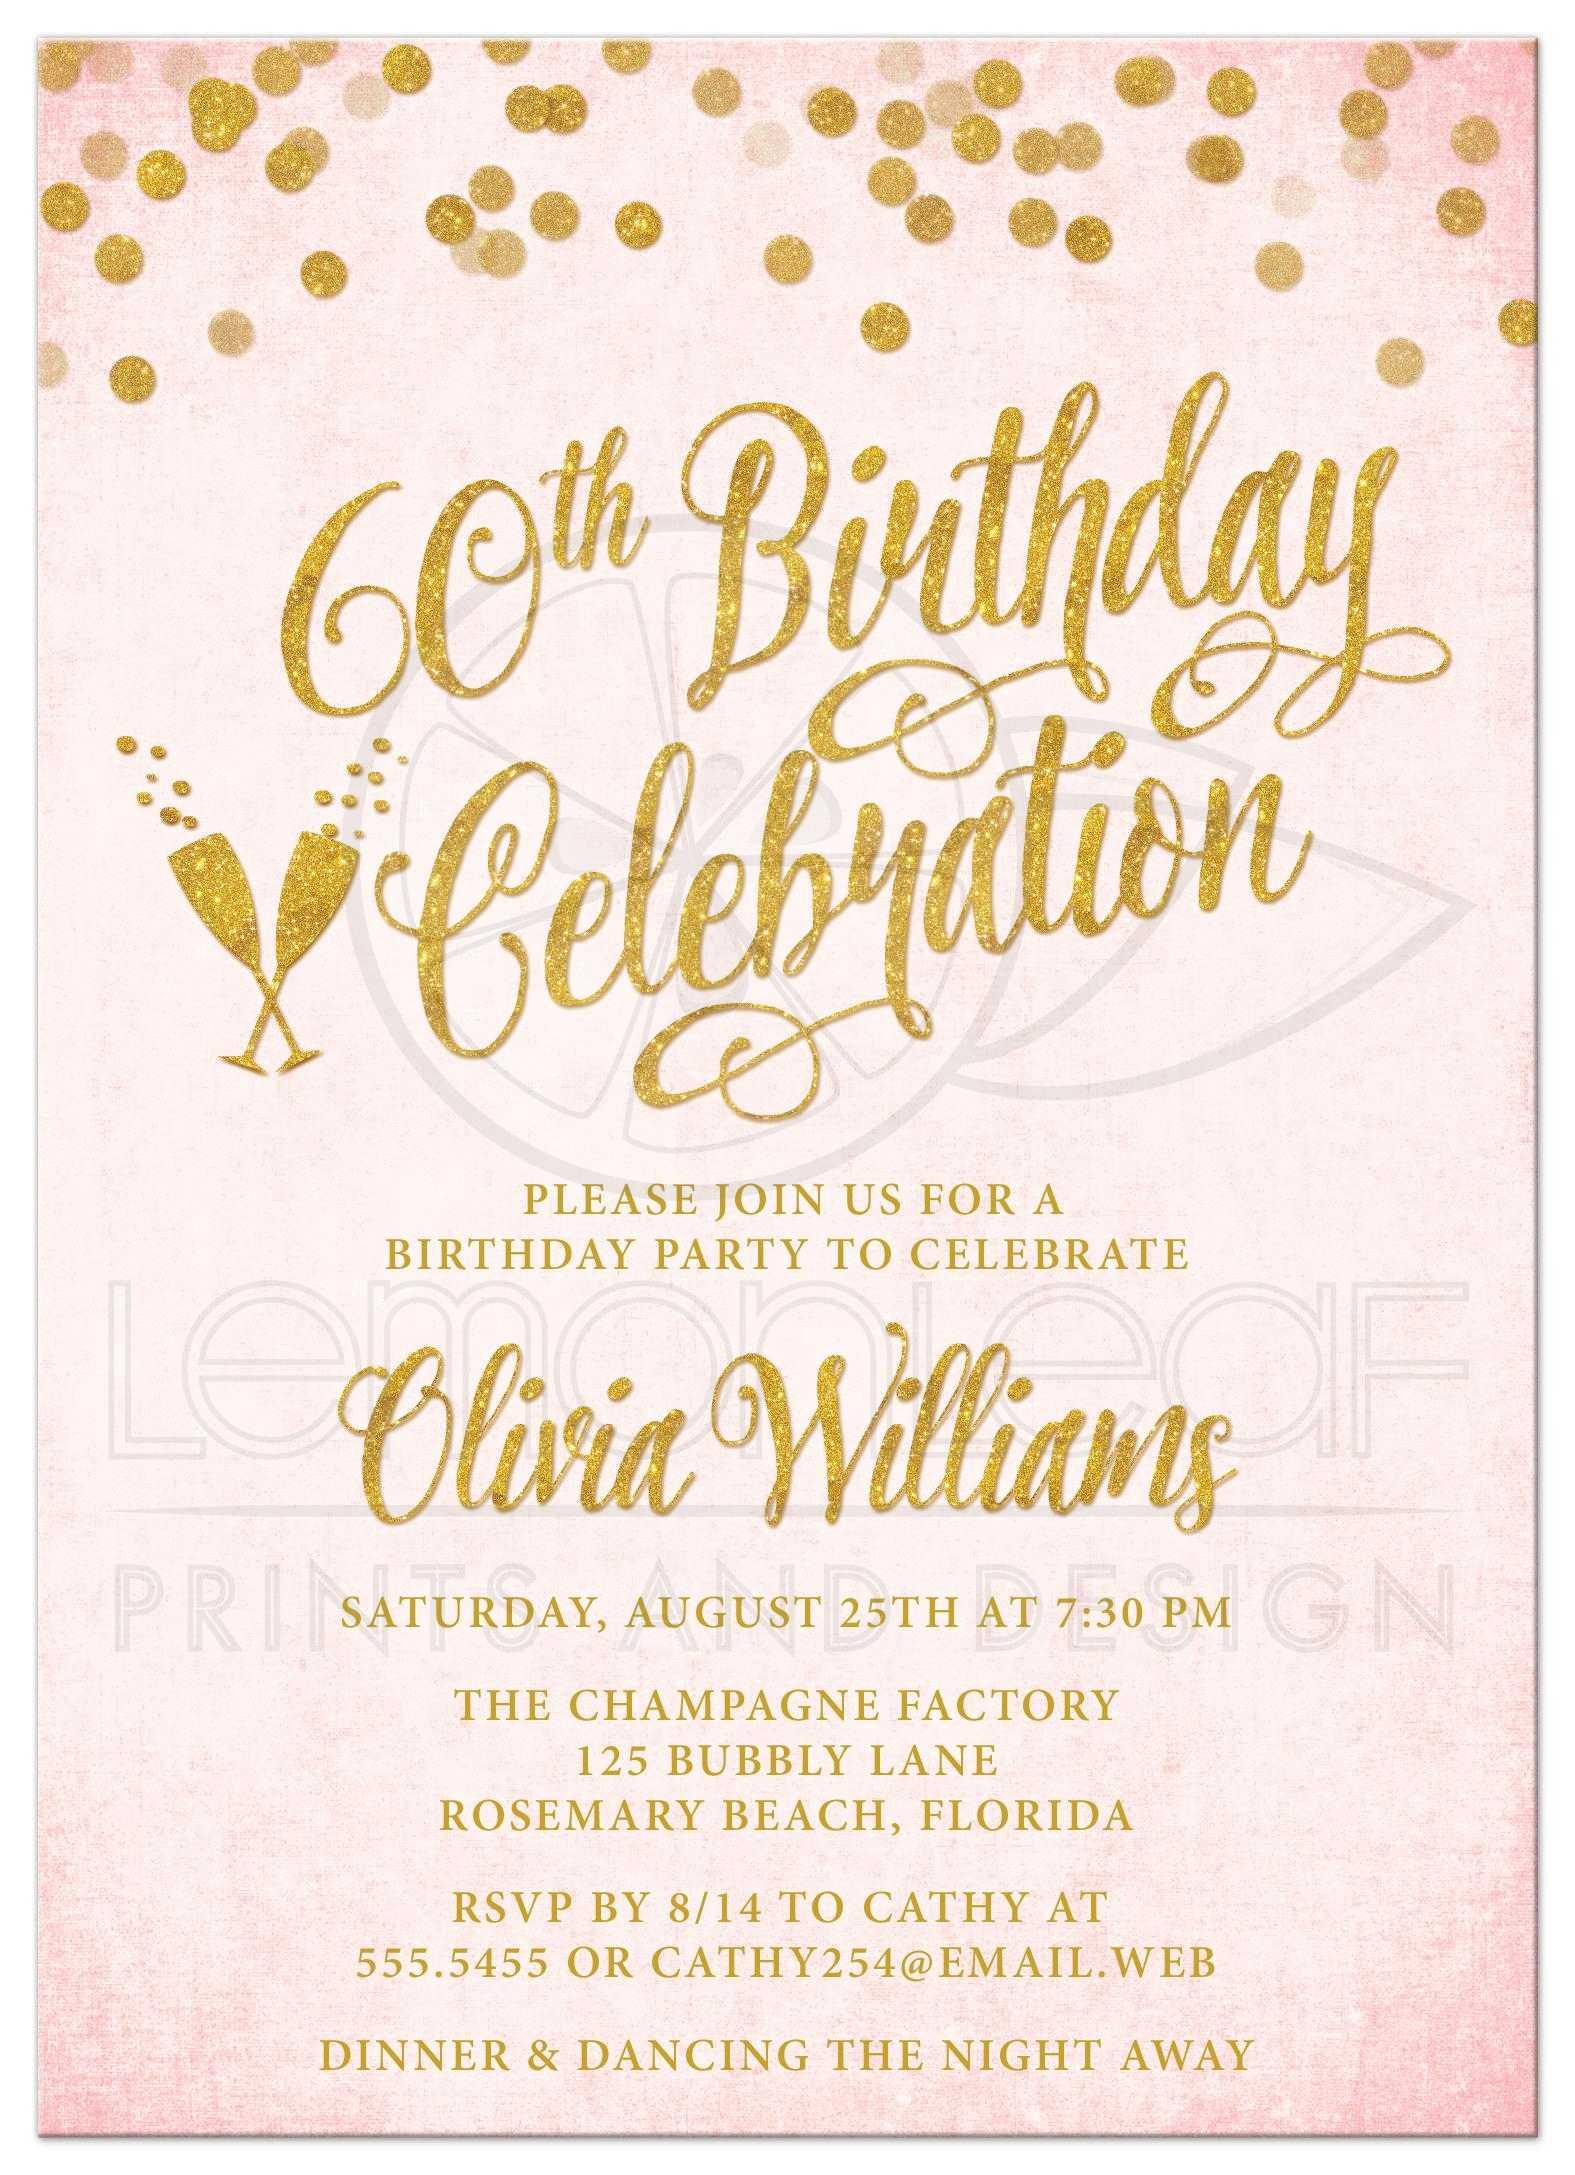 Blush Pink Gold 60th Birthday Party Invitations